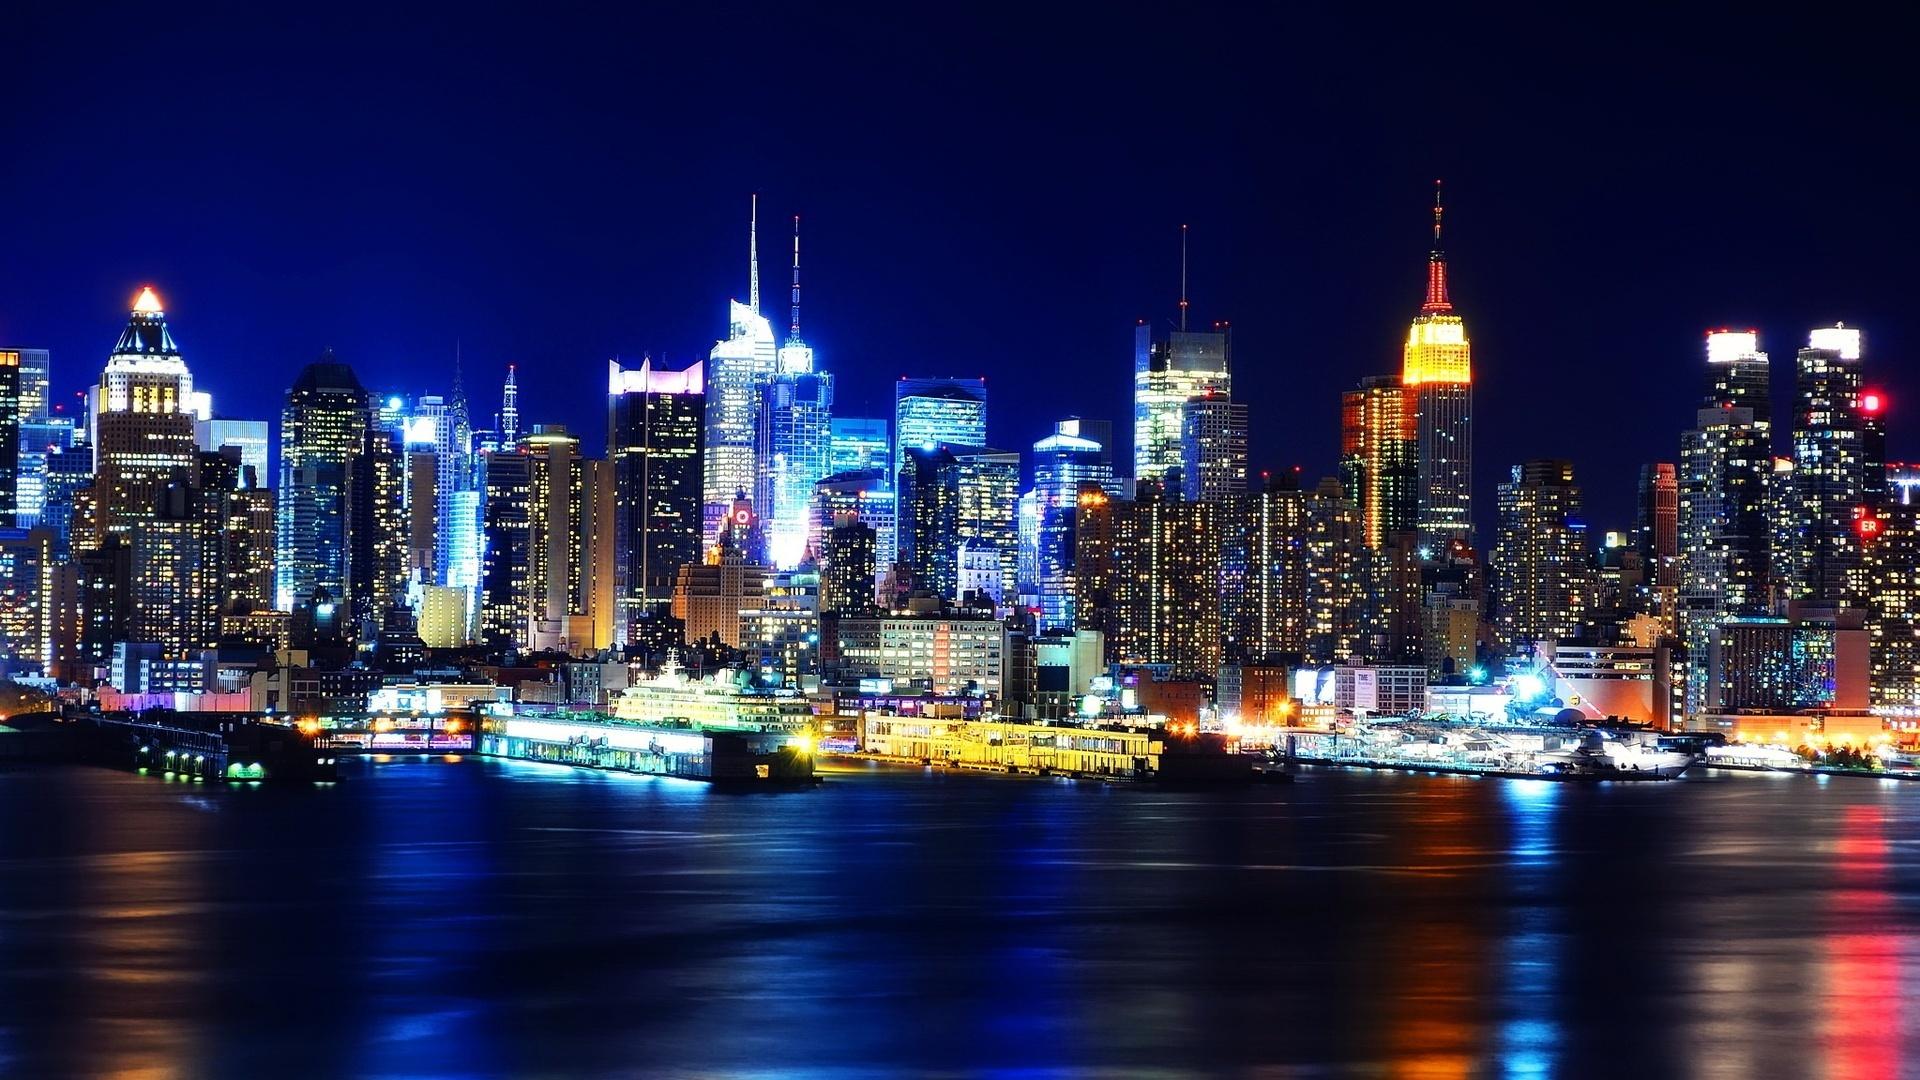 Wallpaper wallpaper New York City at Night Wallpaper hd wallpaper 1920x1080